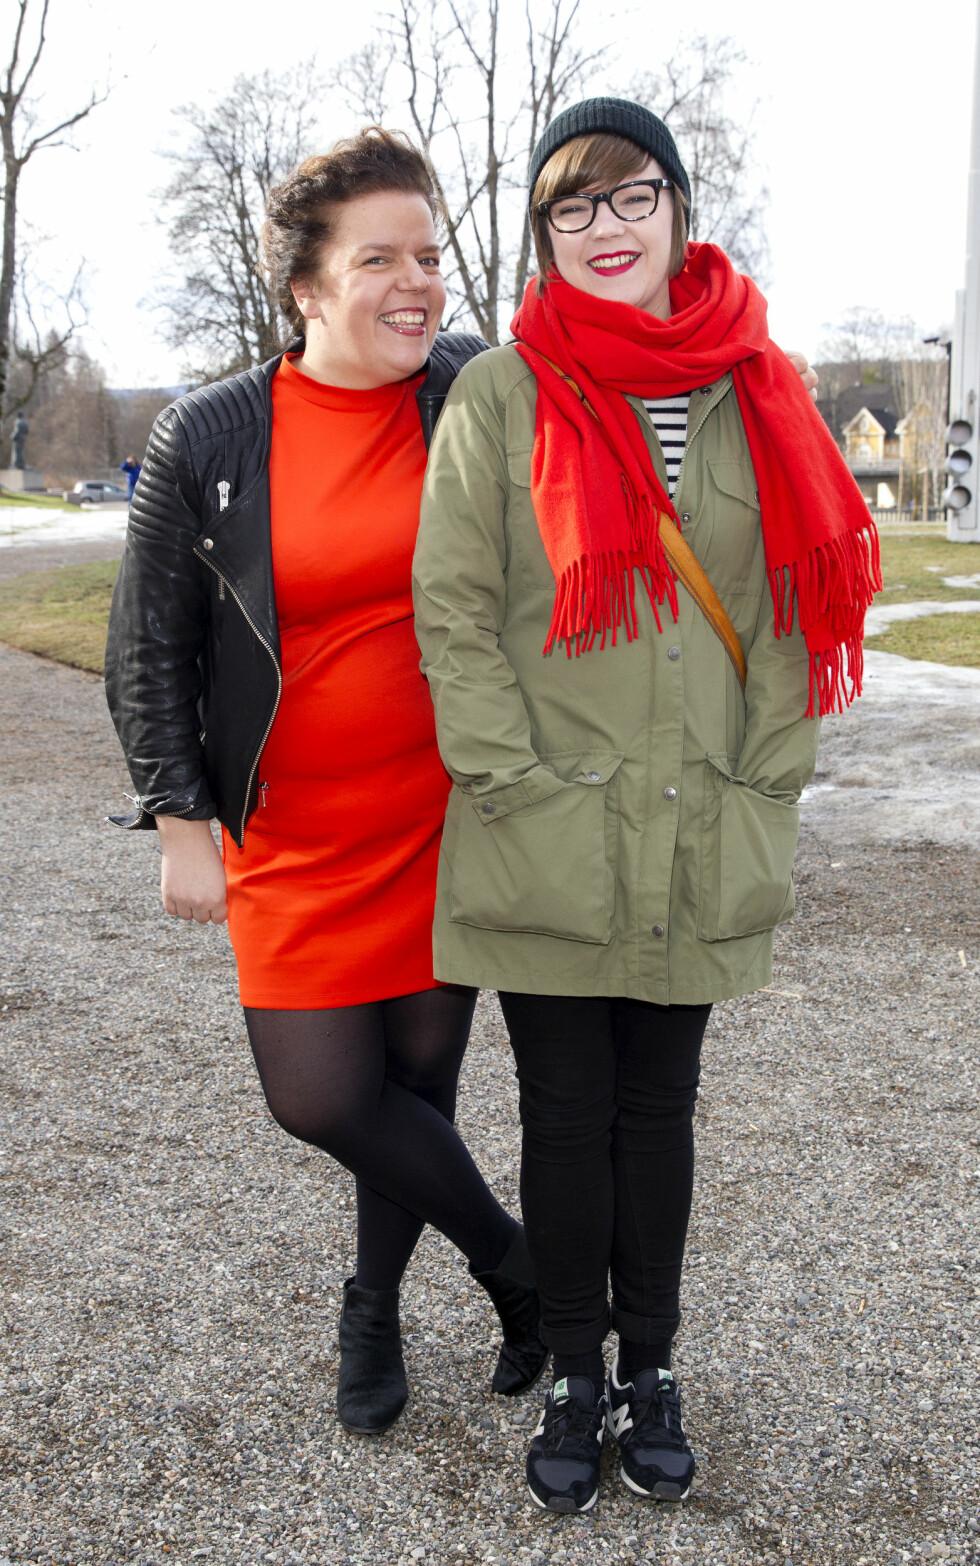 GODT FORHOLD: Else Kåss Furuseth og søsteren Cecillie Ramona Kåss Furuseth er både naboer og feriekamerater.   Foto: Andreas Fadum